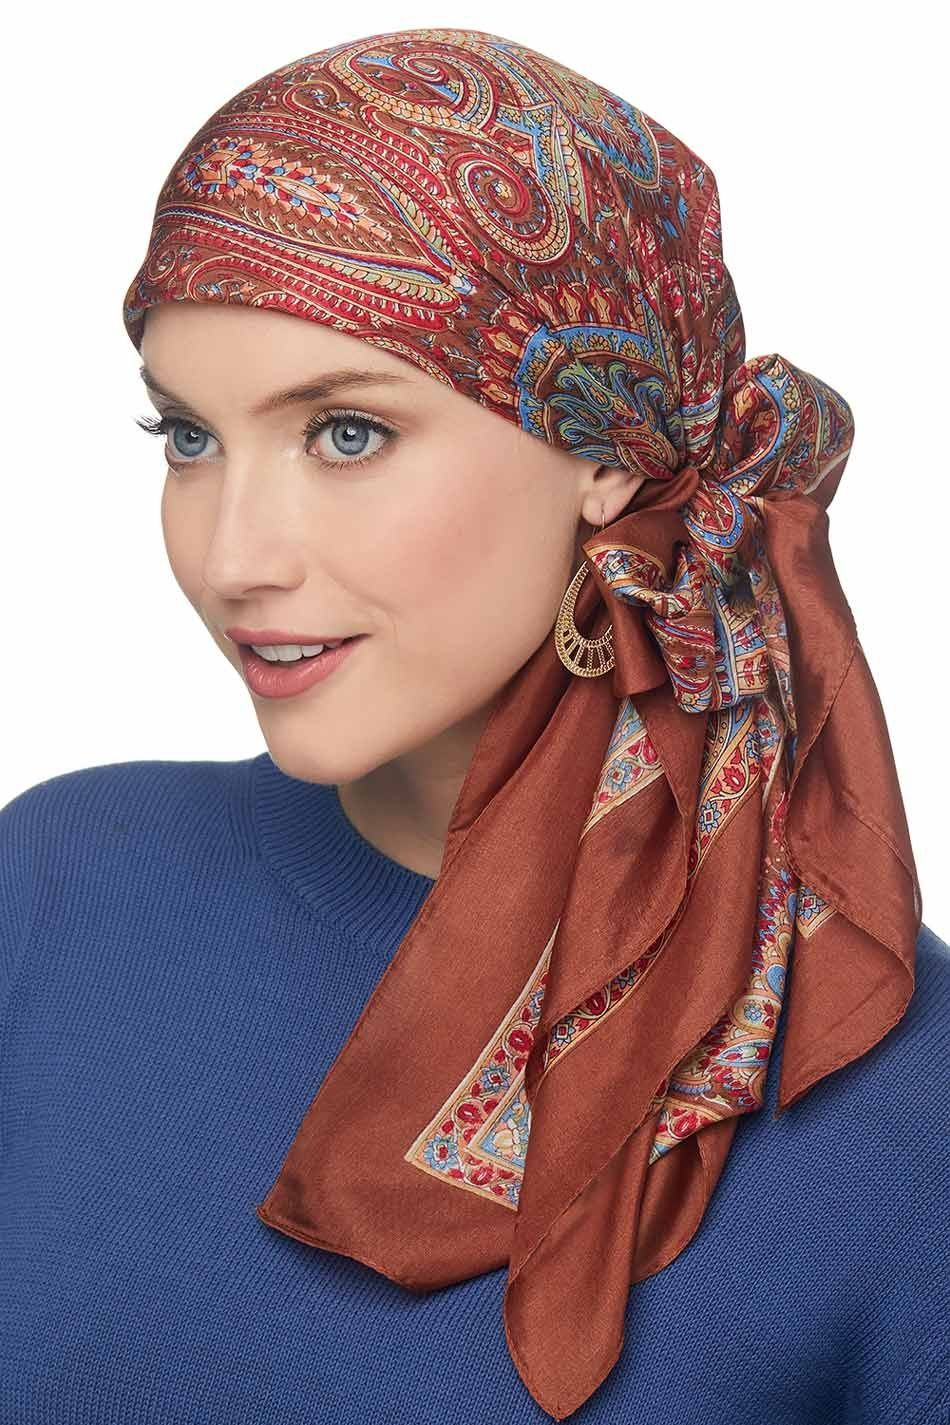 Female Silk Head Wrap Scarf Headdress Folding Turban Hat Pre-Tied Scarves BS